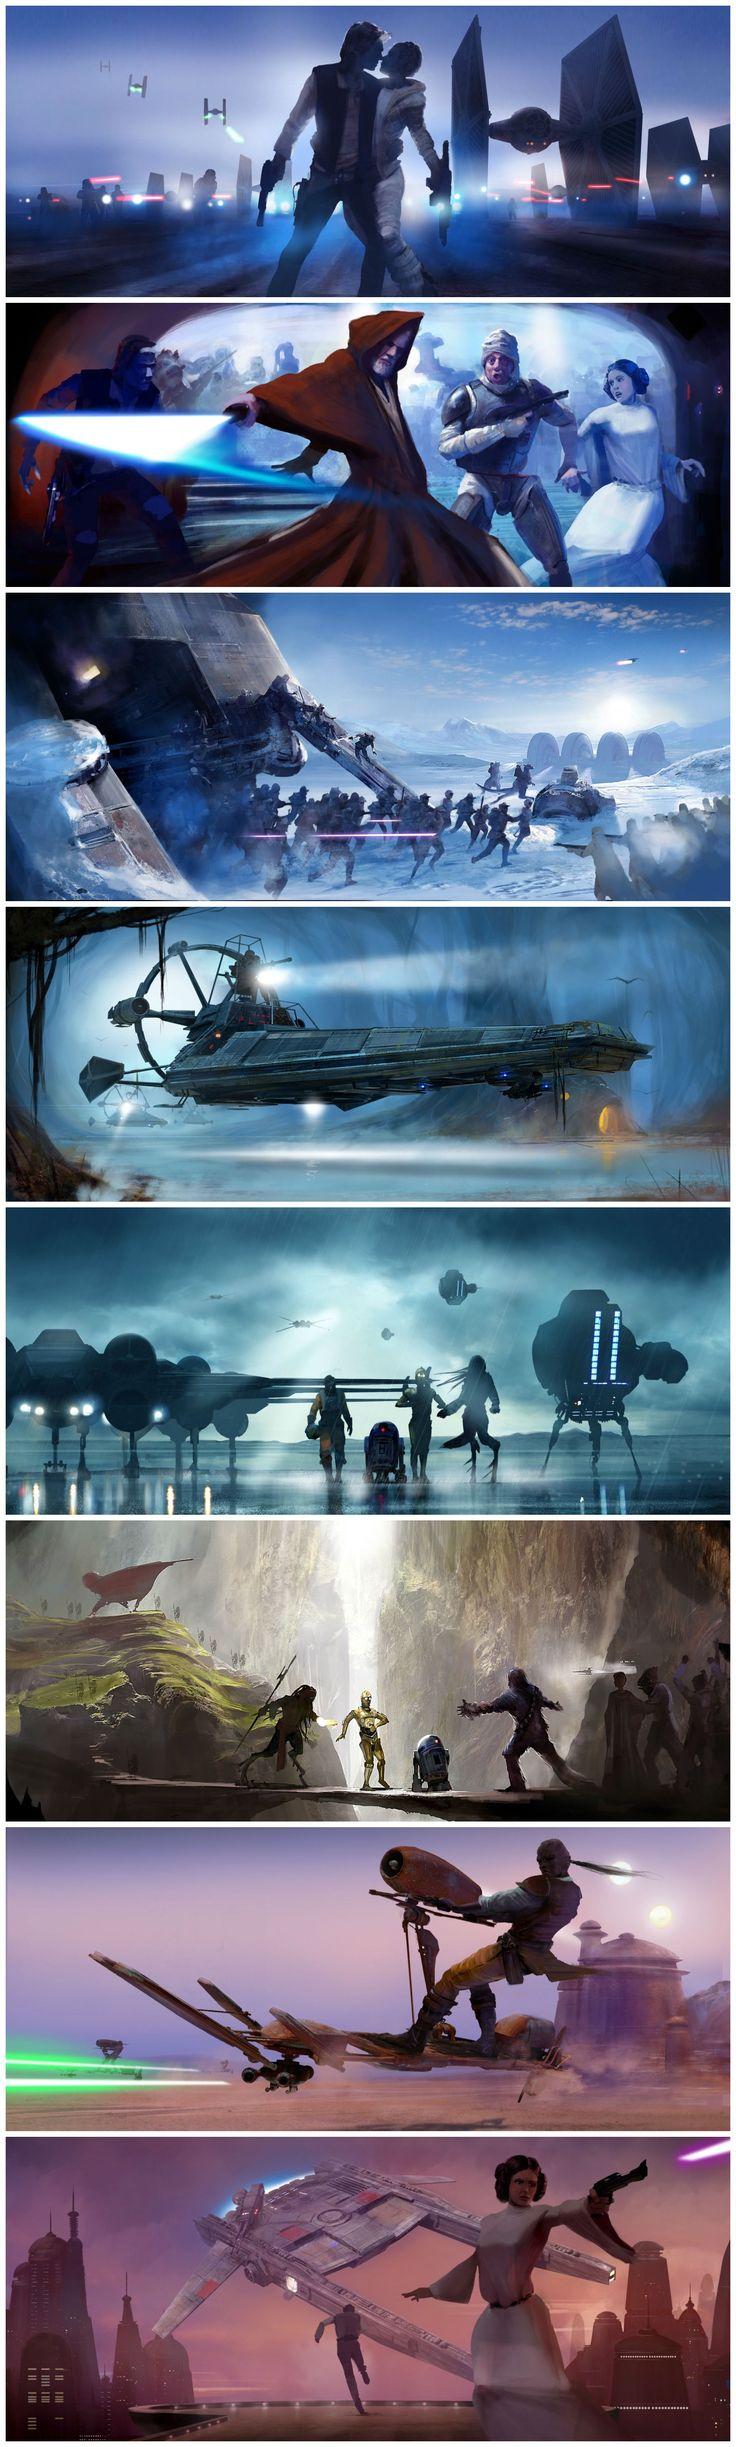 Star Wars // by Kris Turvey